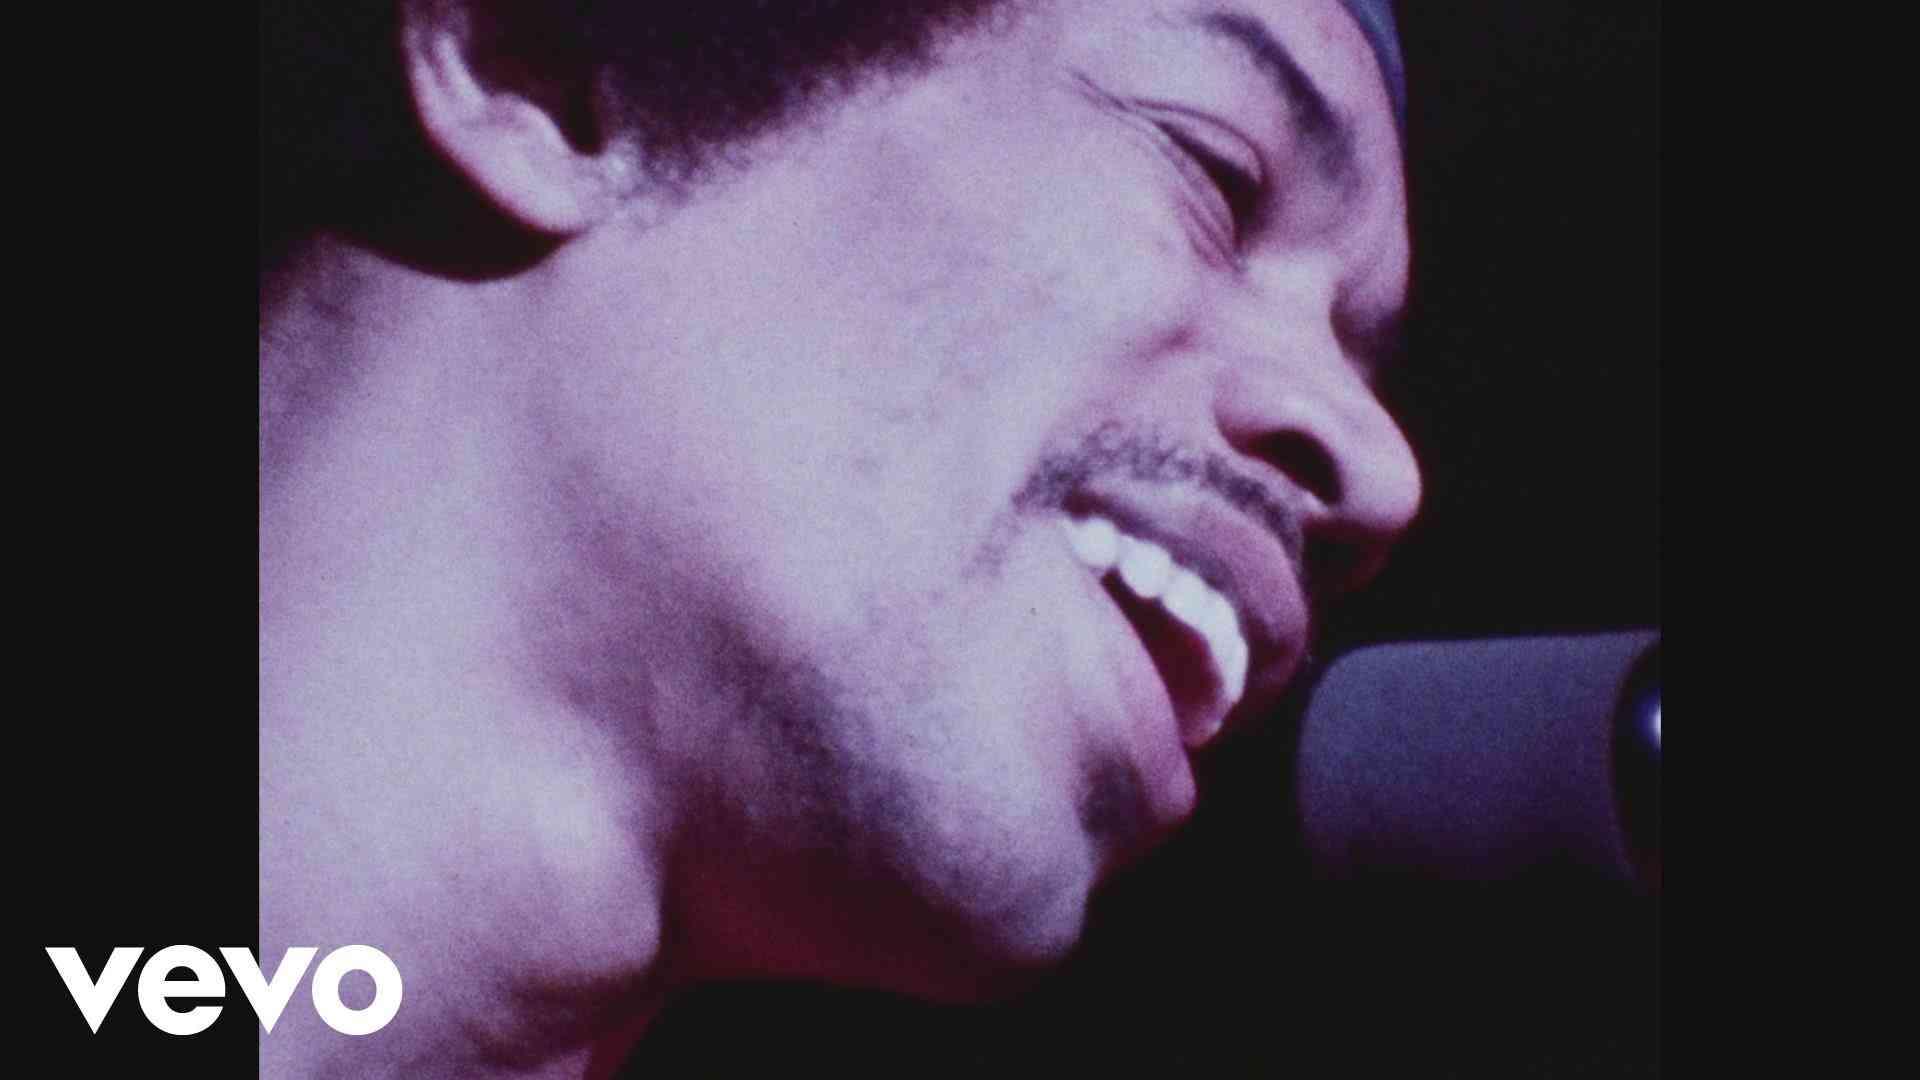 The Jimi Hendrix Experience - Purple Haze (Live at the Atlanta Pop Festival) - YouTube